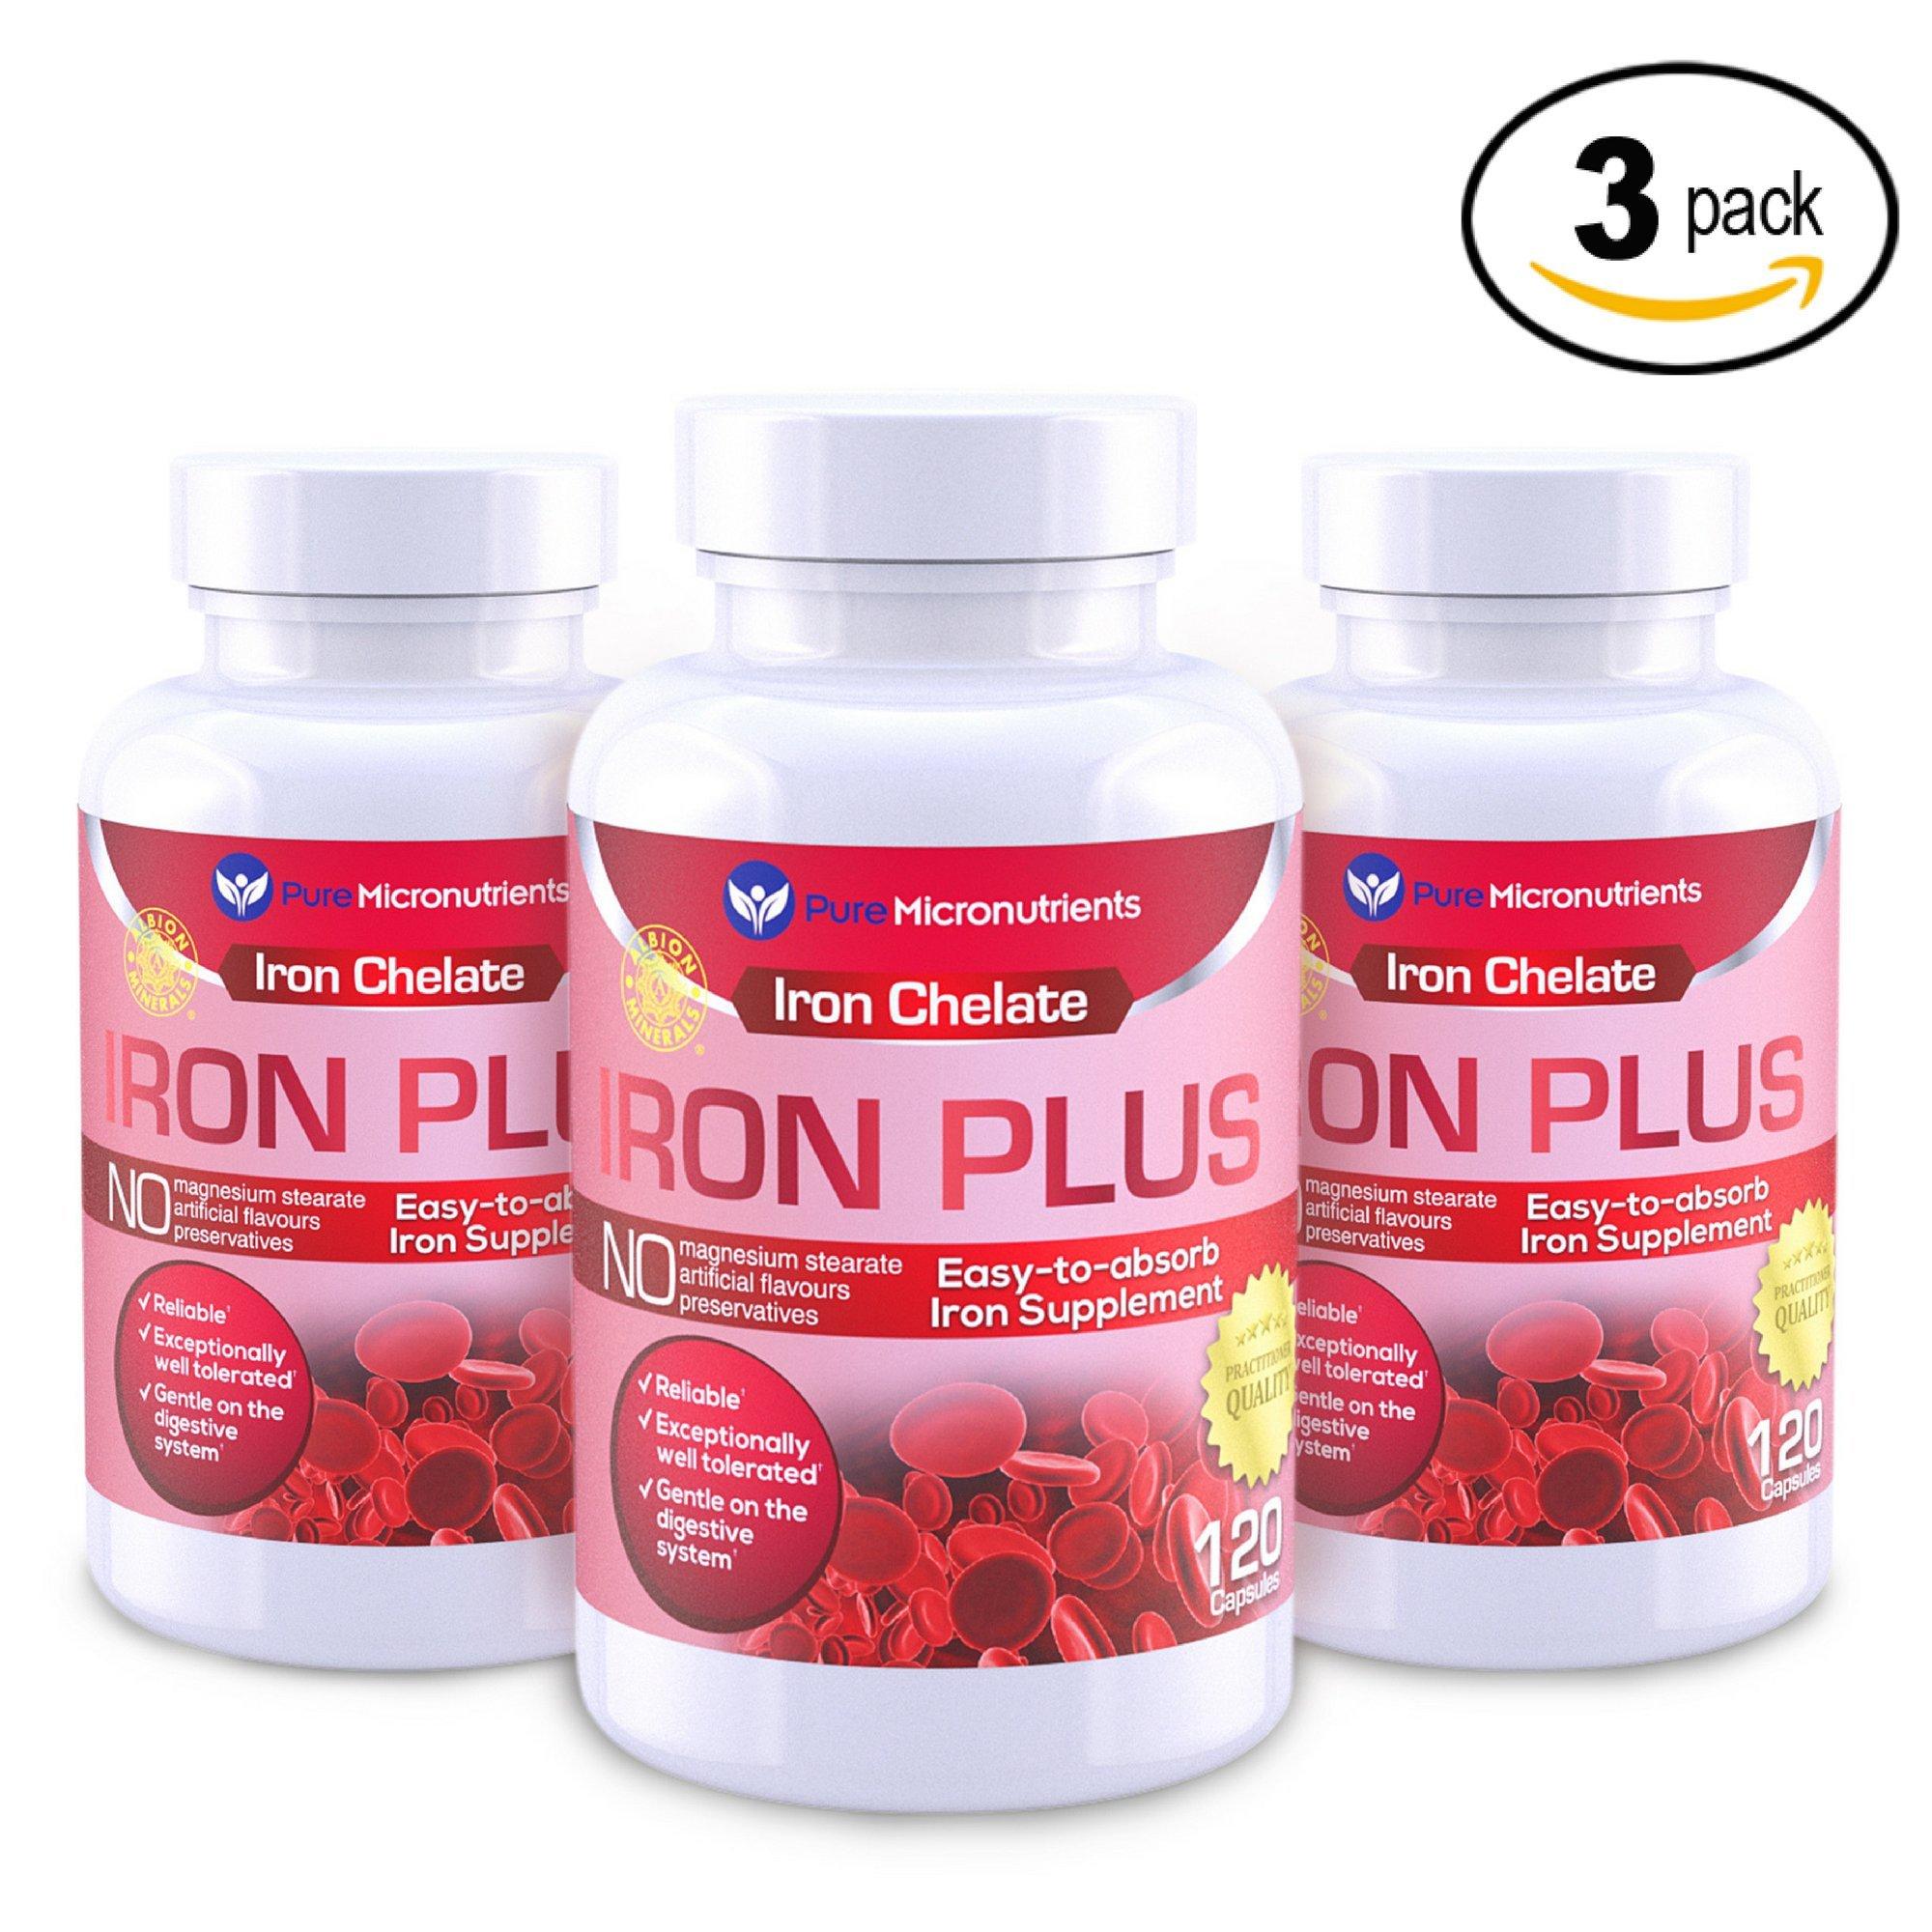 Pure Micronutrients Iron Plus Supplement, Natural Ferrous Chelate, Bisglycinate 25mg + Vitamin C, B6, B12, Folic Acid, 120 Count (3-Pack)